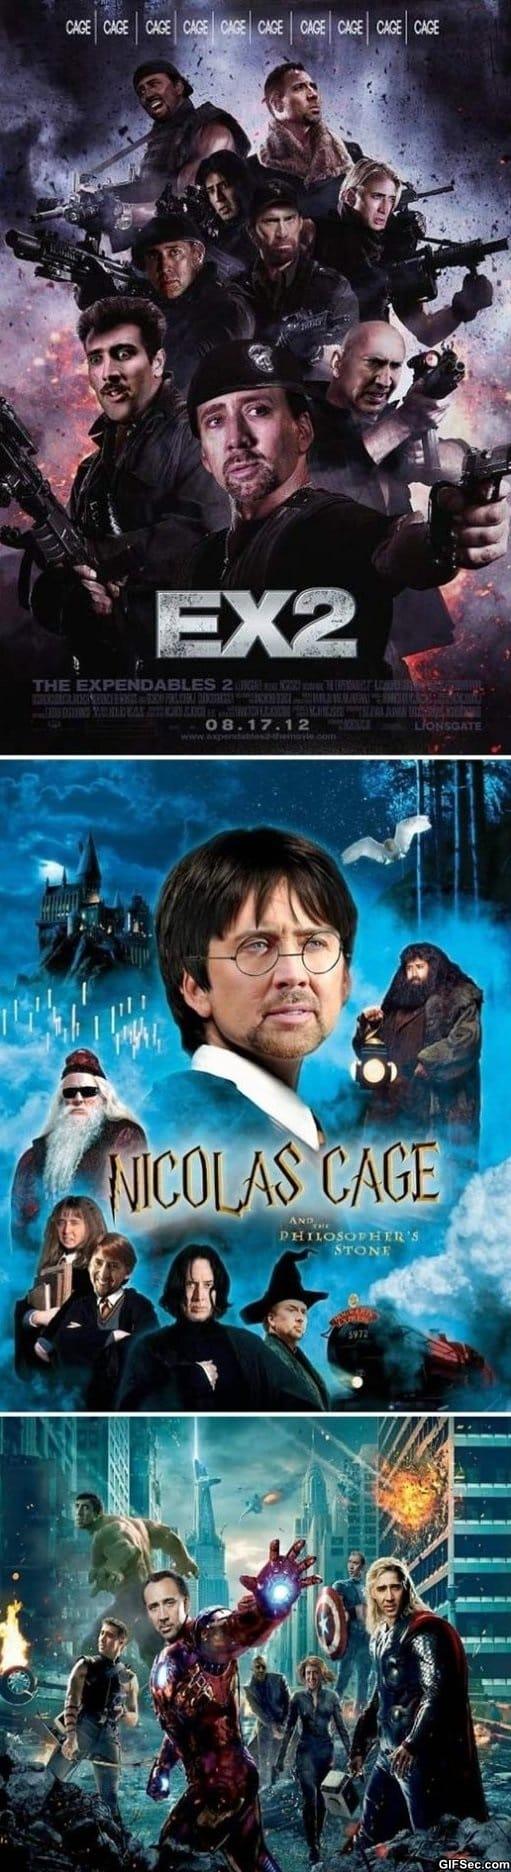 Starring Nicolas Cage